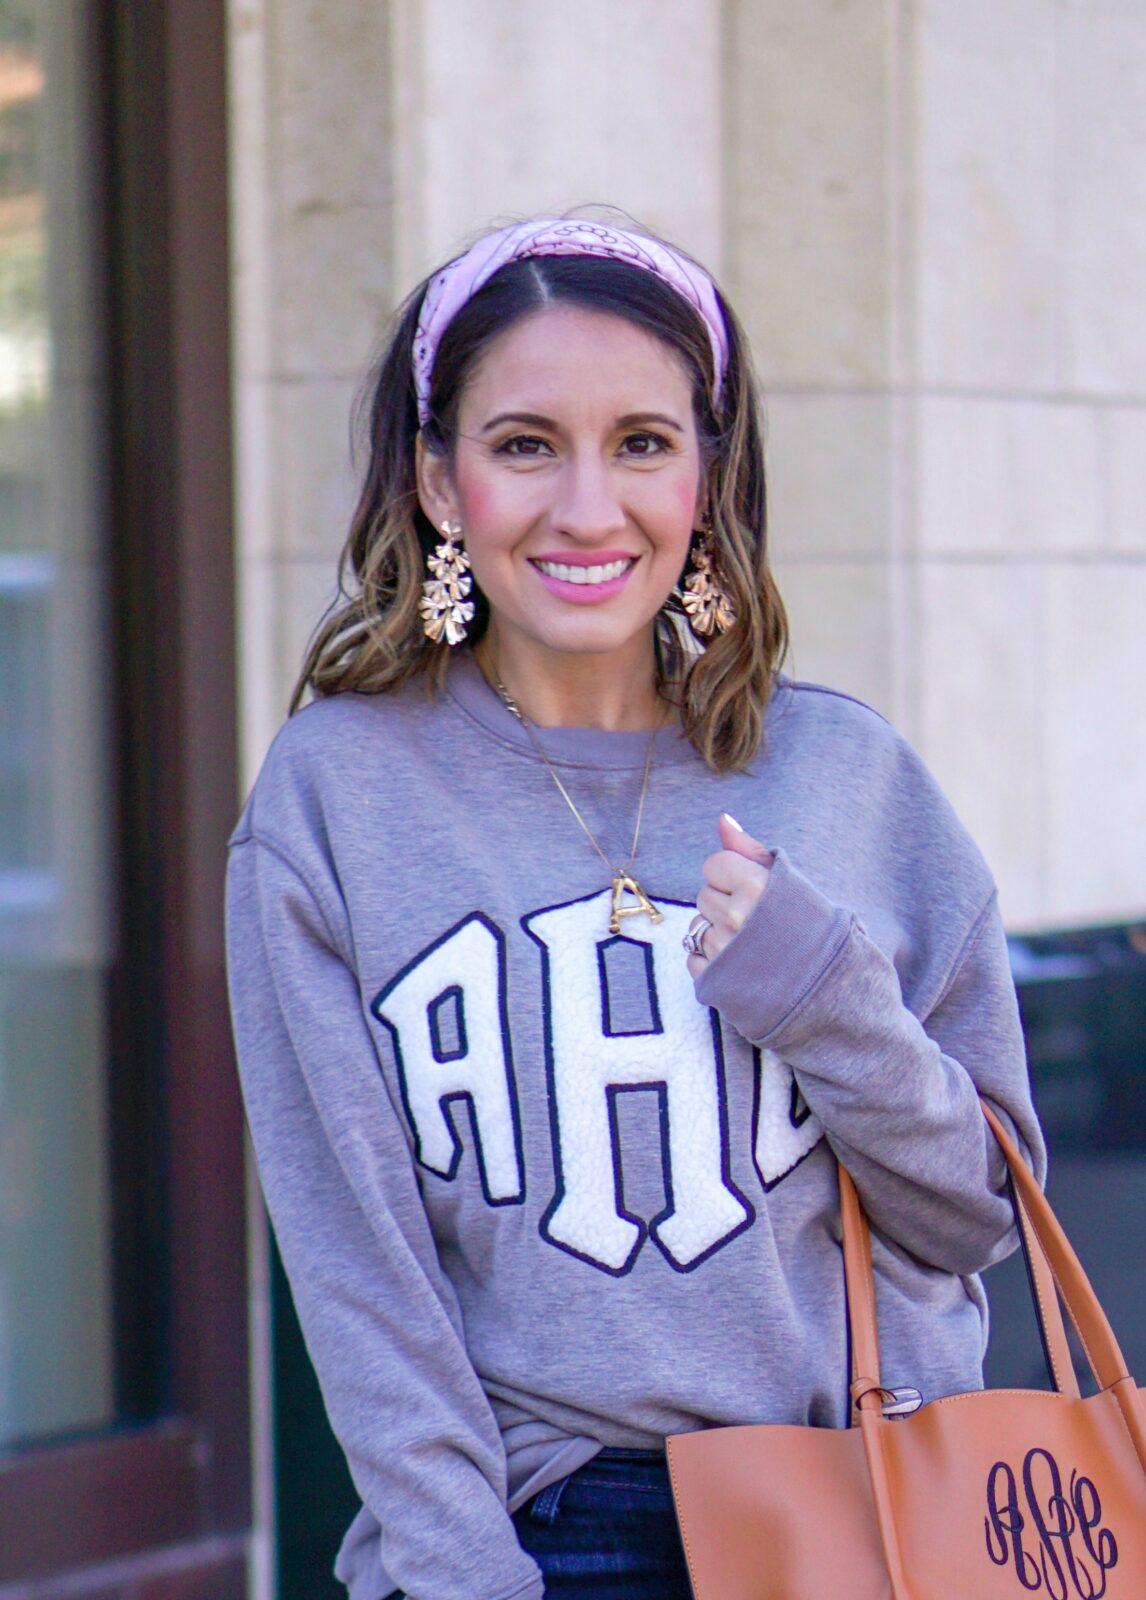 Pink Bandana, Grey monogrammed sweatshirt and brown handbag